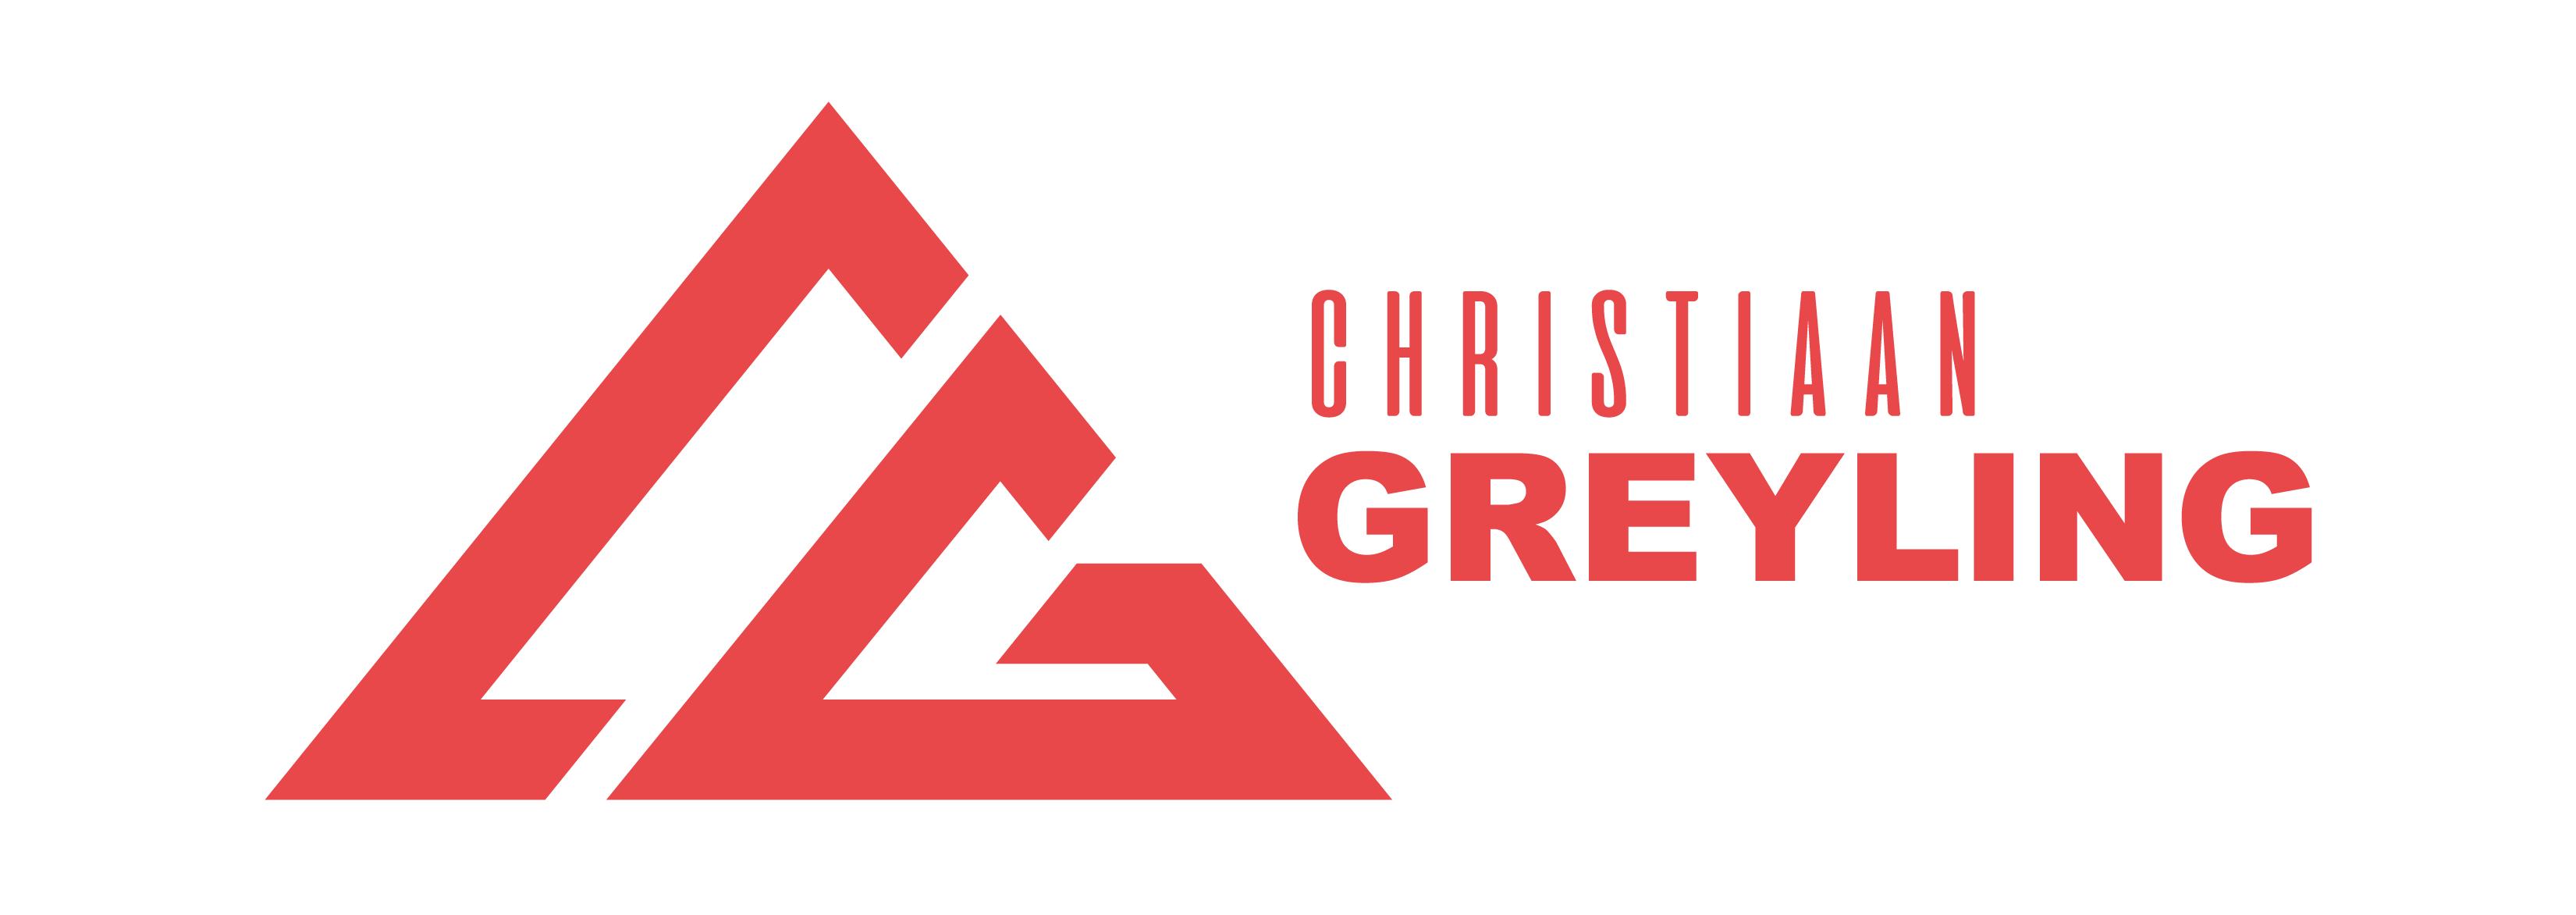 Christiaan Greyling